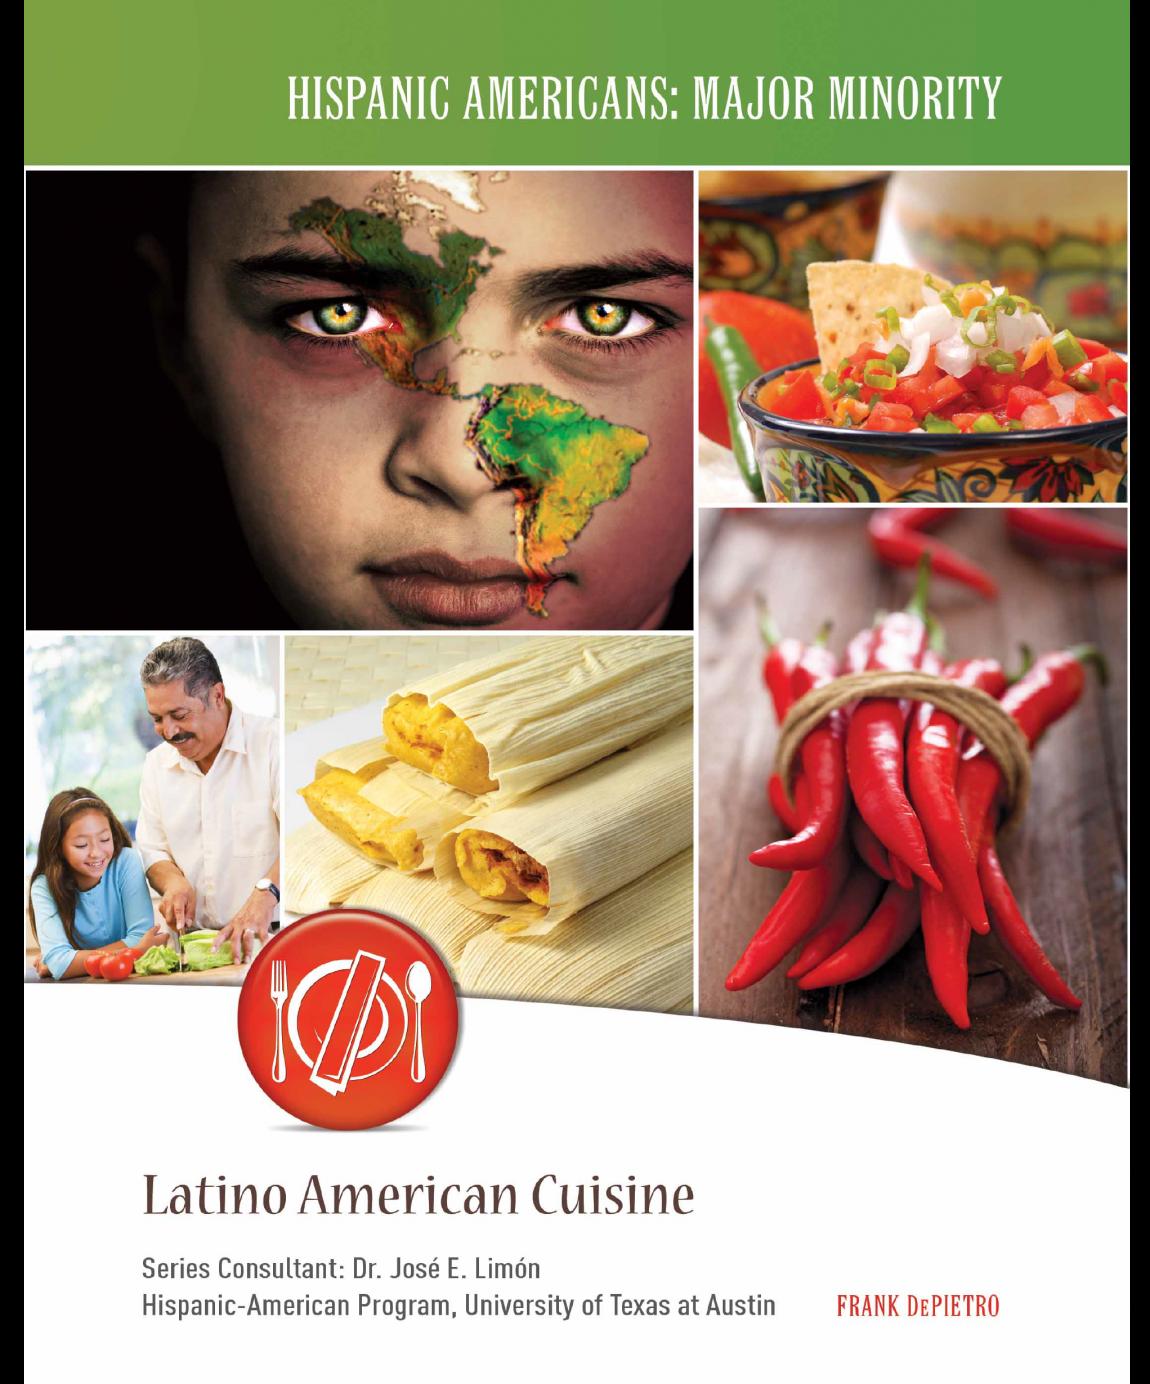 latino-american-cuisine-01.png